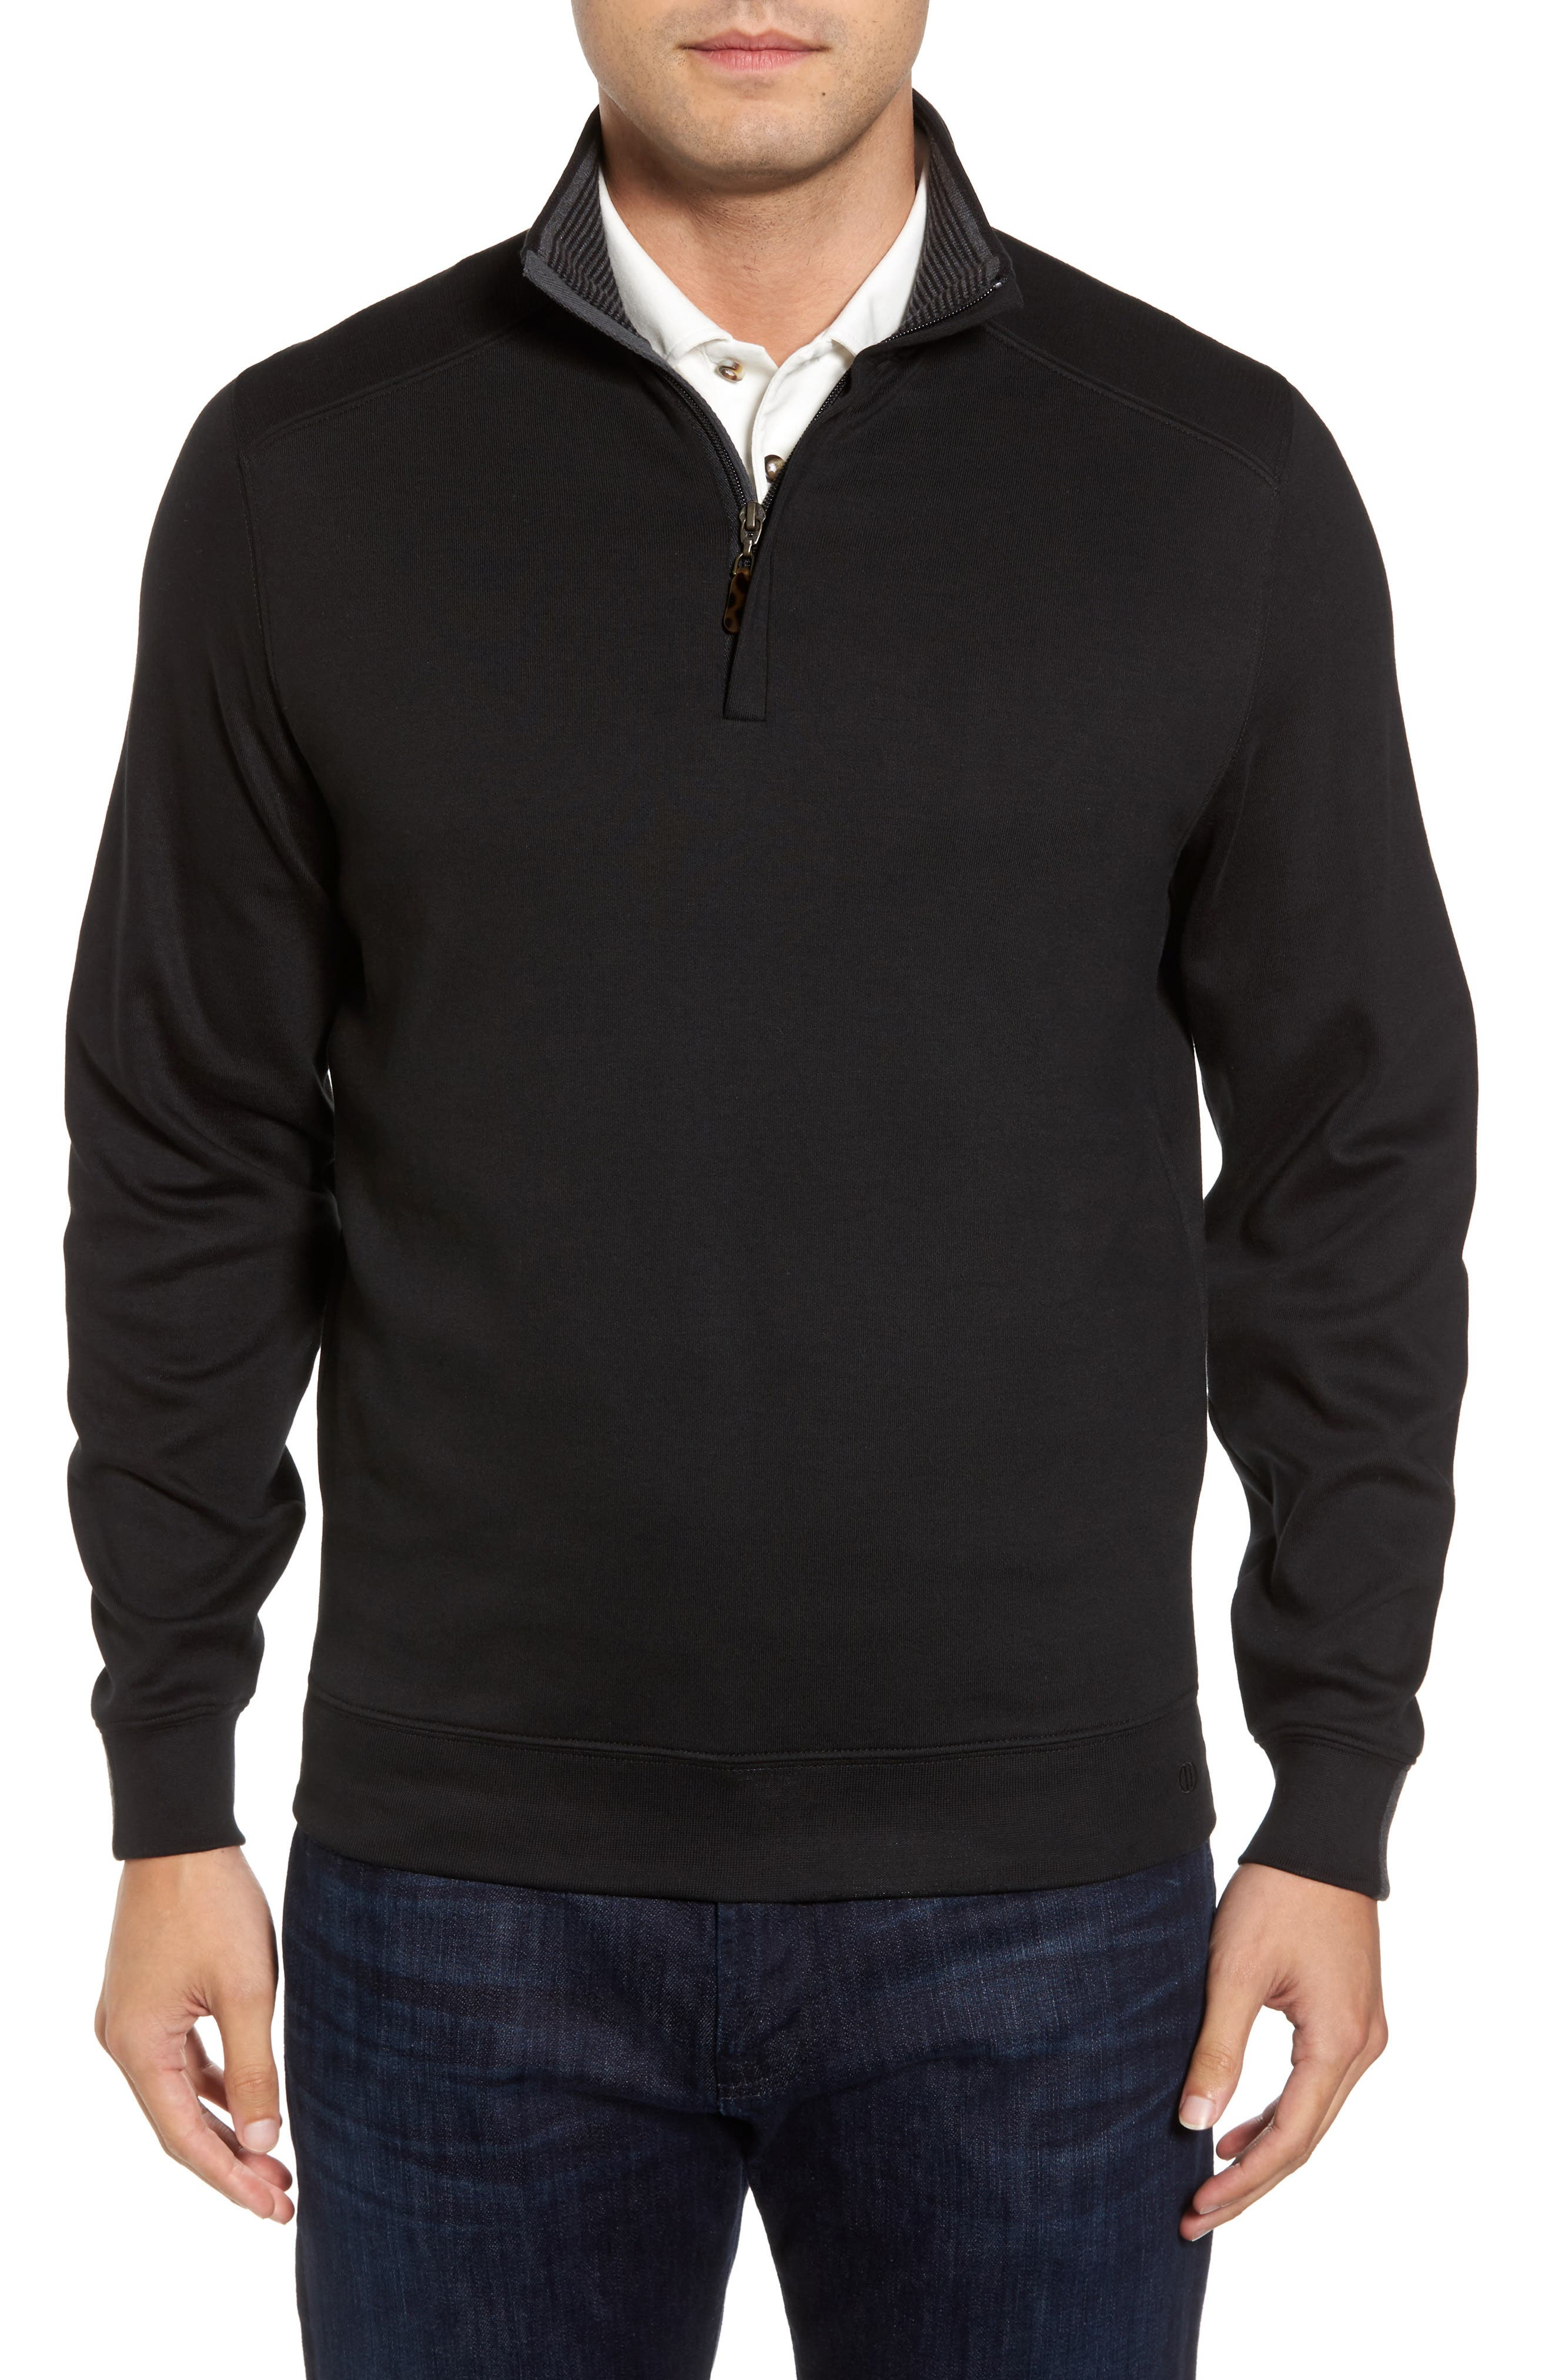 Interlock Knit Quarter Zip Pullover,                         Main,                         color, Black